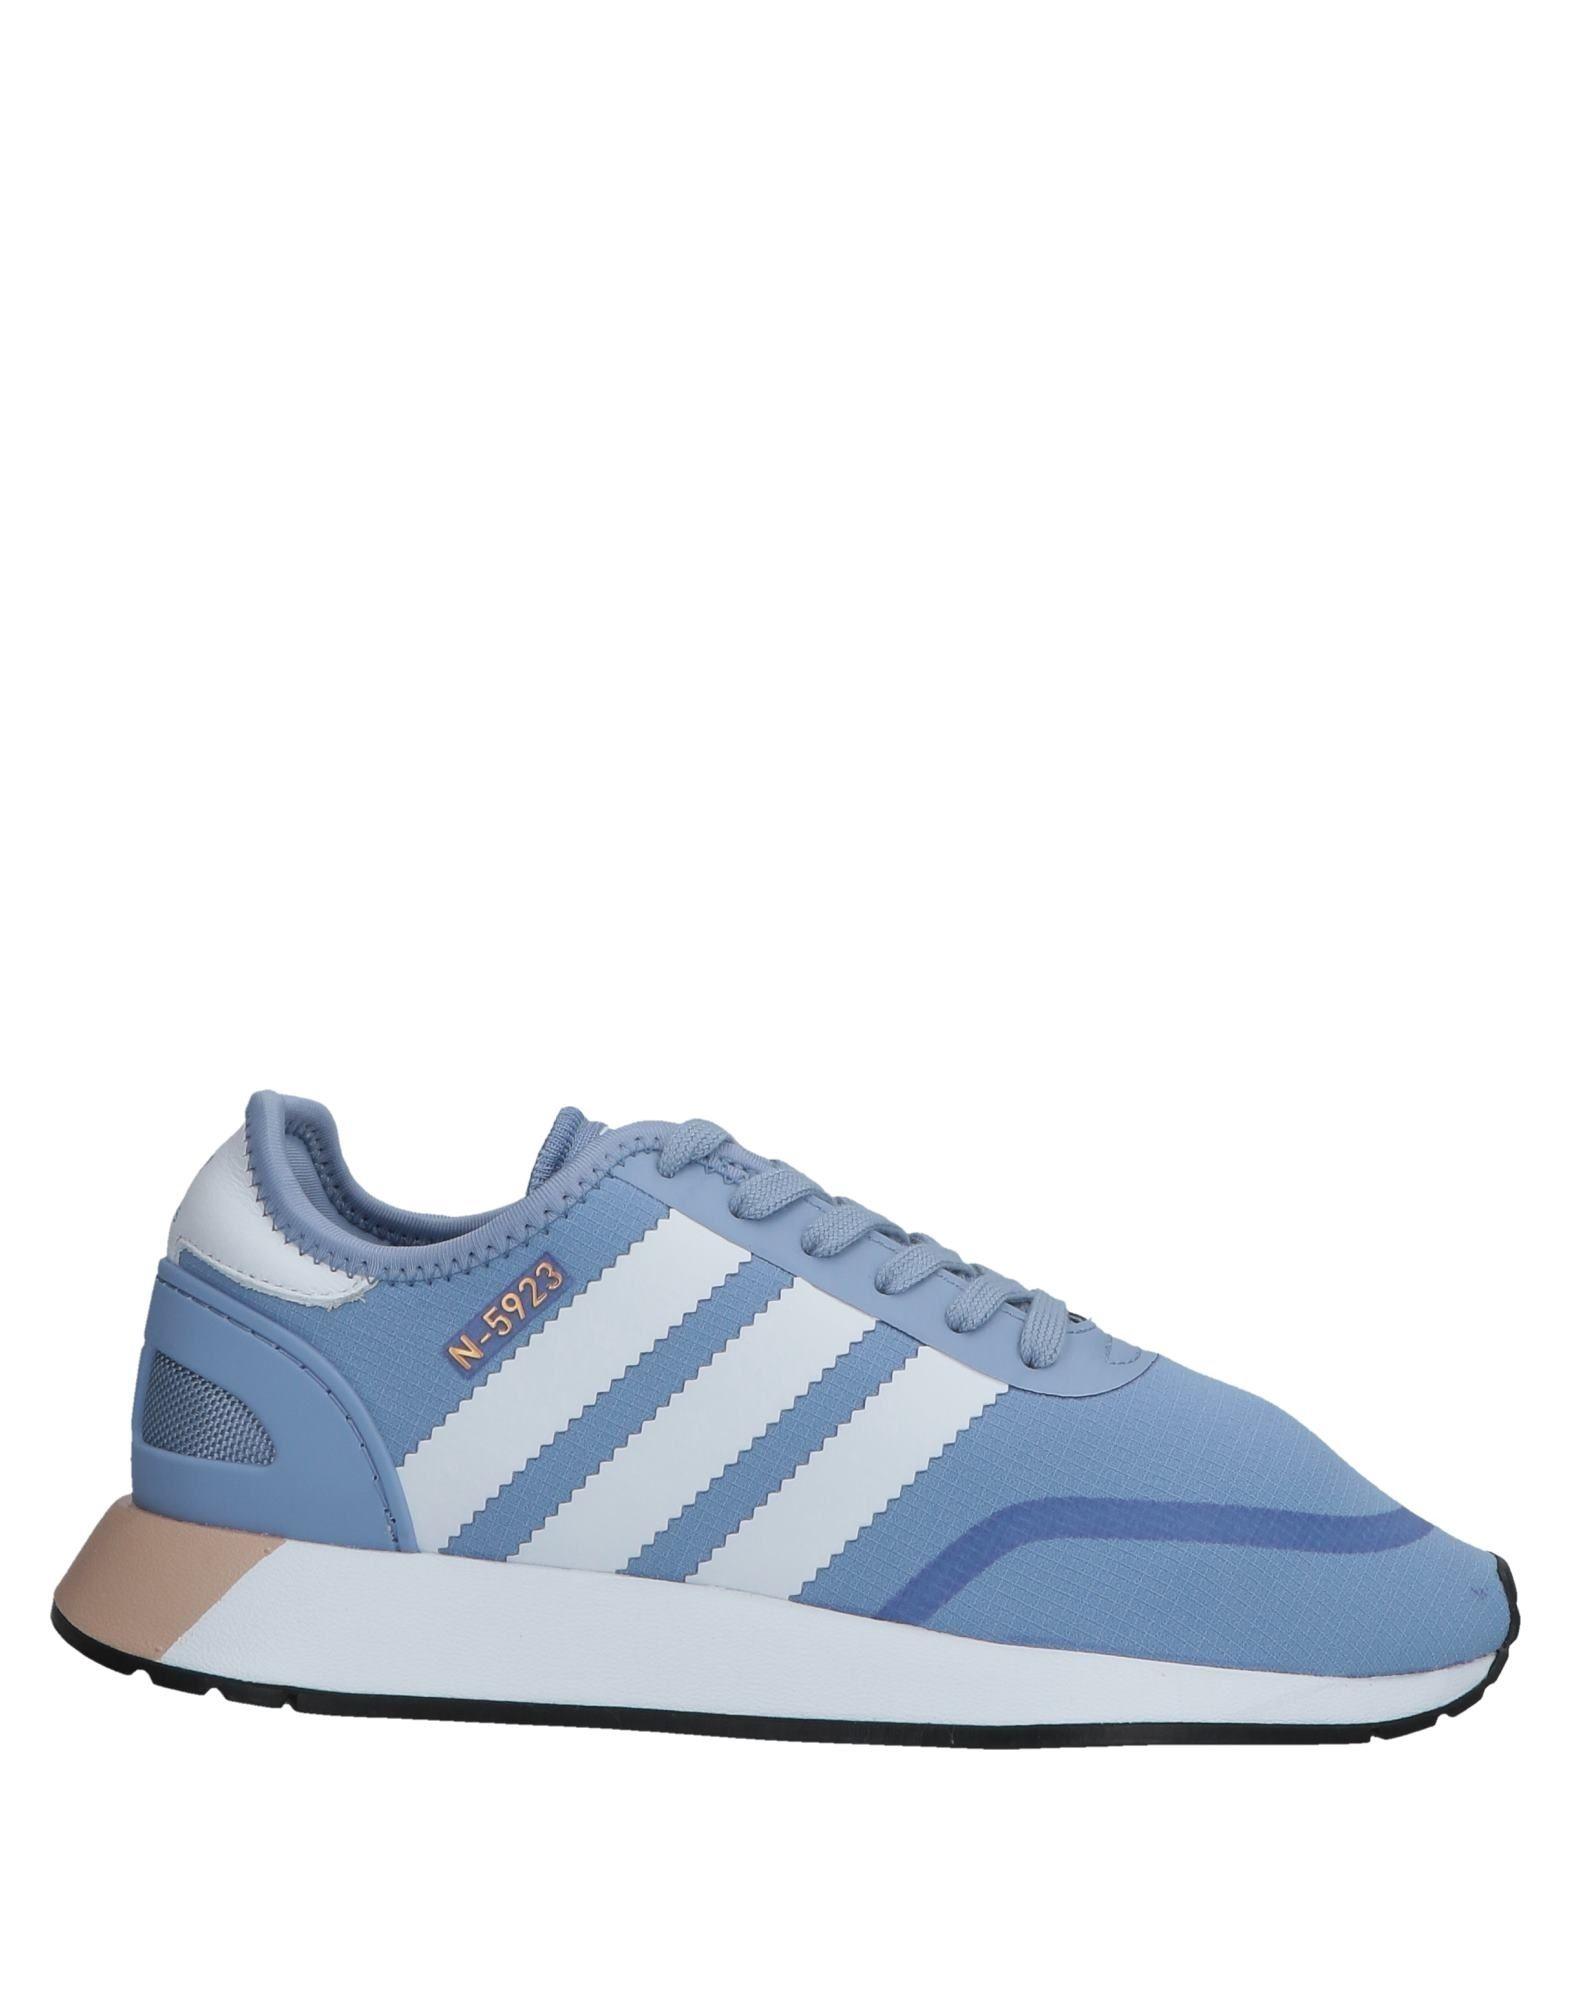 Adidas Originals Sneakers - Women Adidas Originals Sneakers online on 11561746VO  United Kingdom - 11561746VO on 0ae340